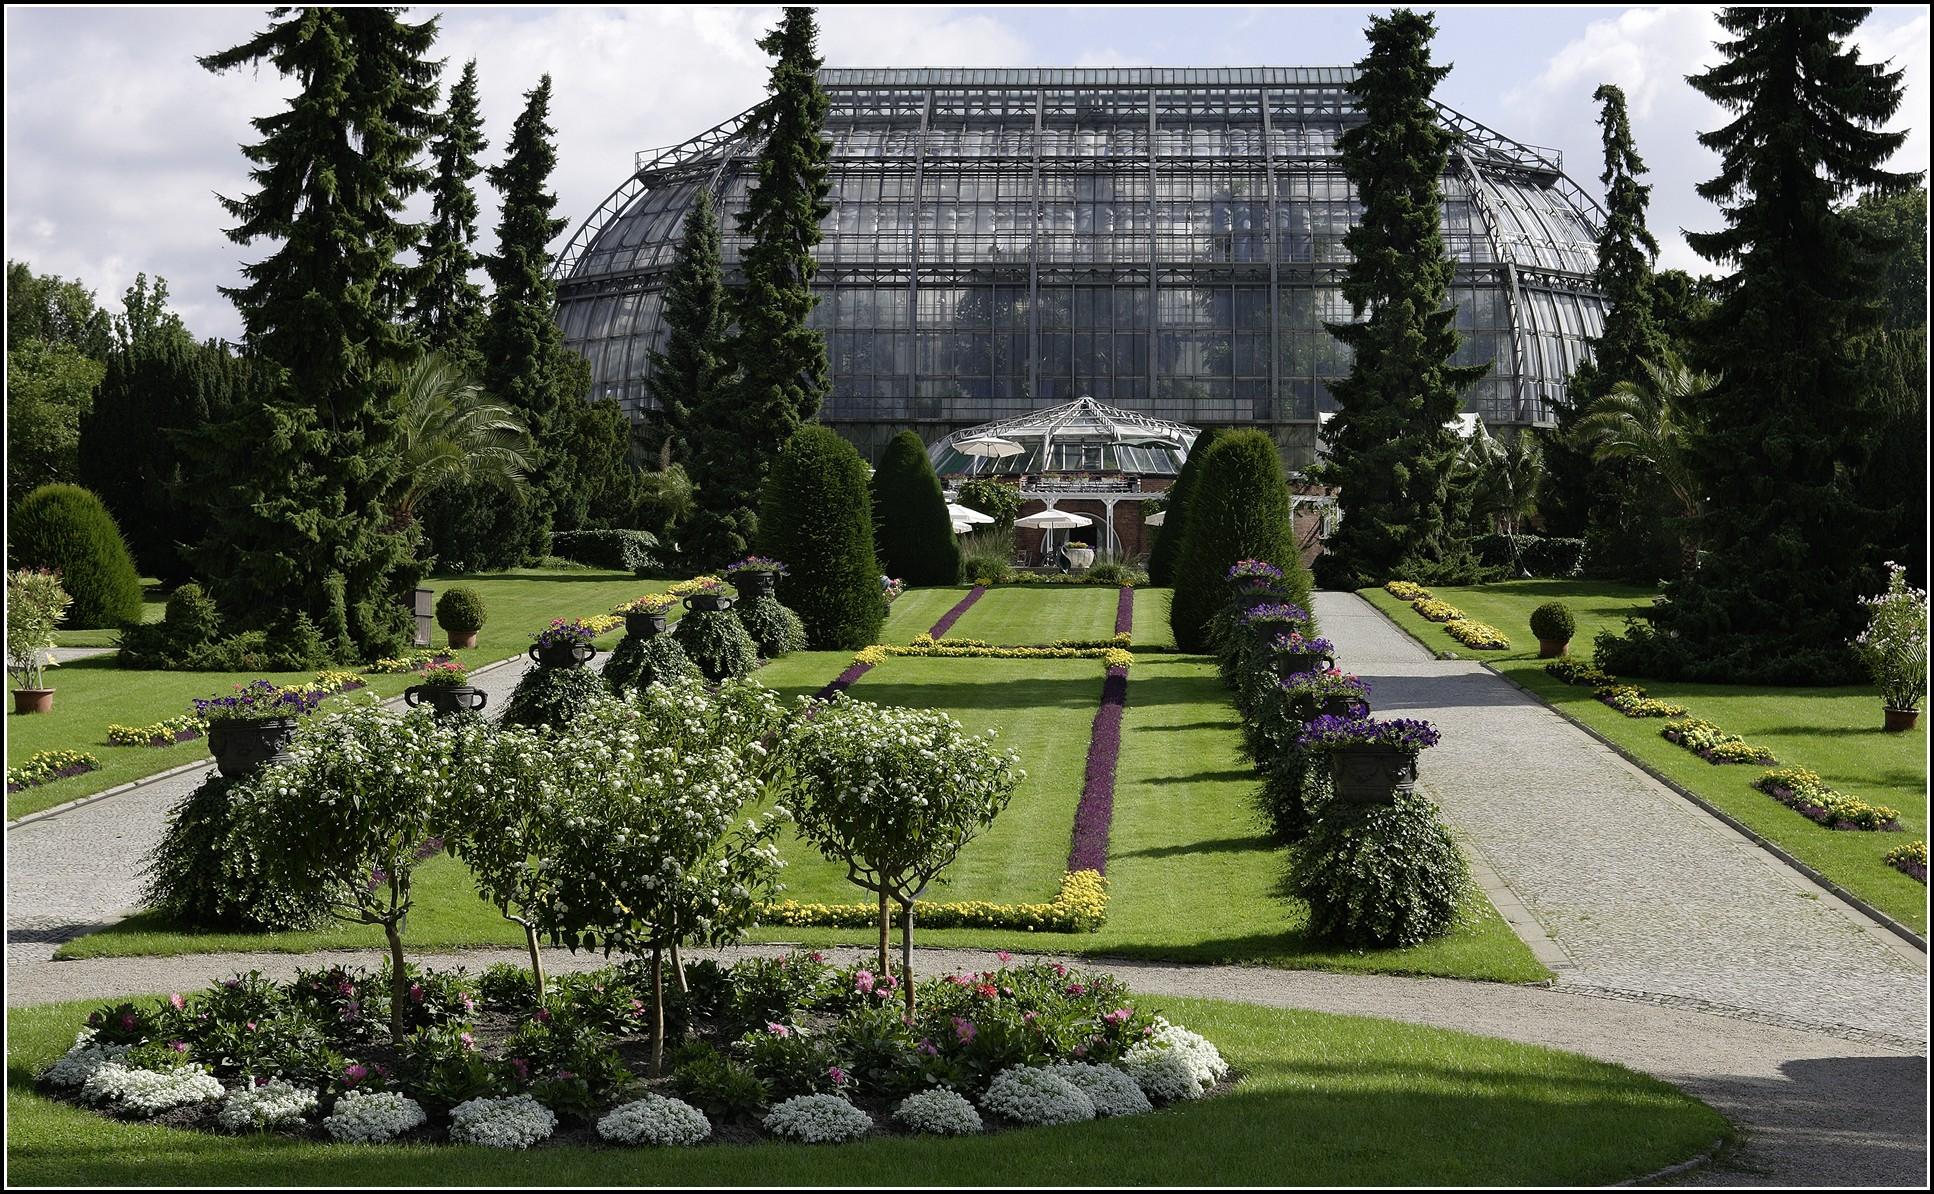 Botanischer Garten Berlin Veranstaltungen 2012